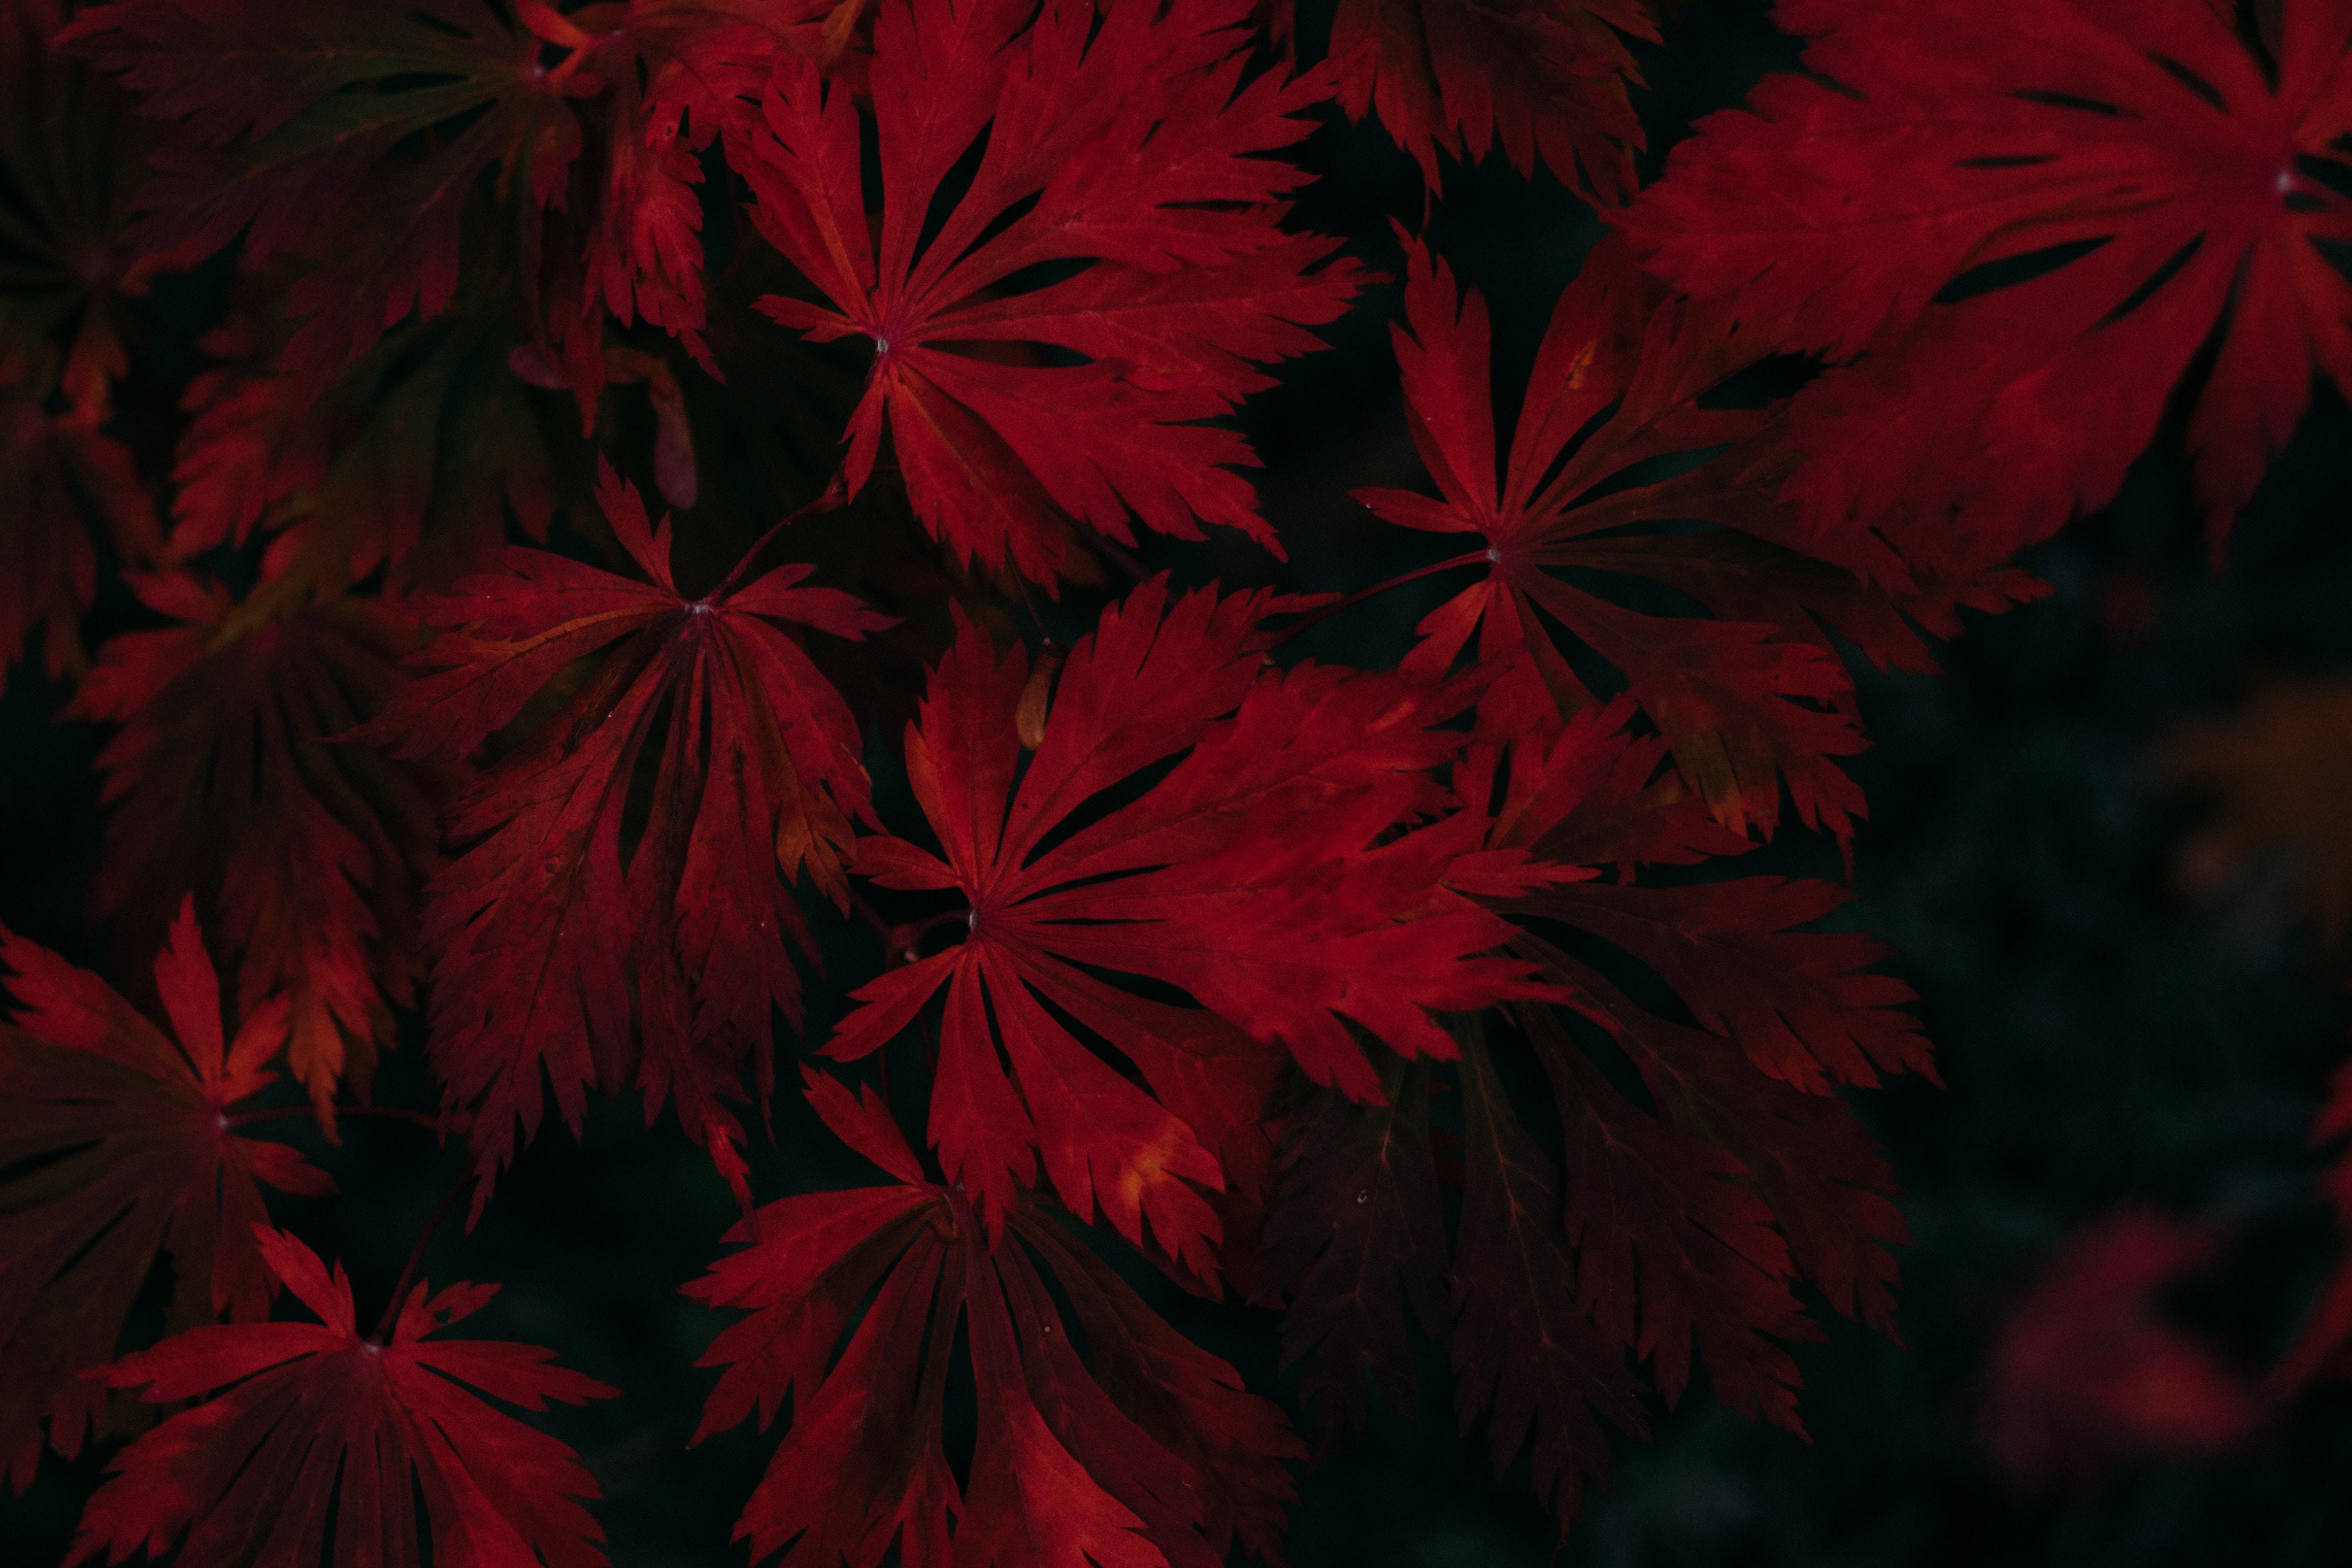 Leaf Dark Vignette Autumn Fall 4k Hd Photography 4k